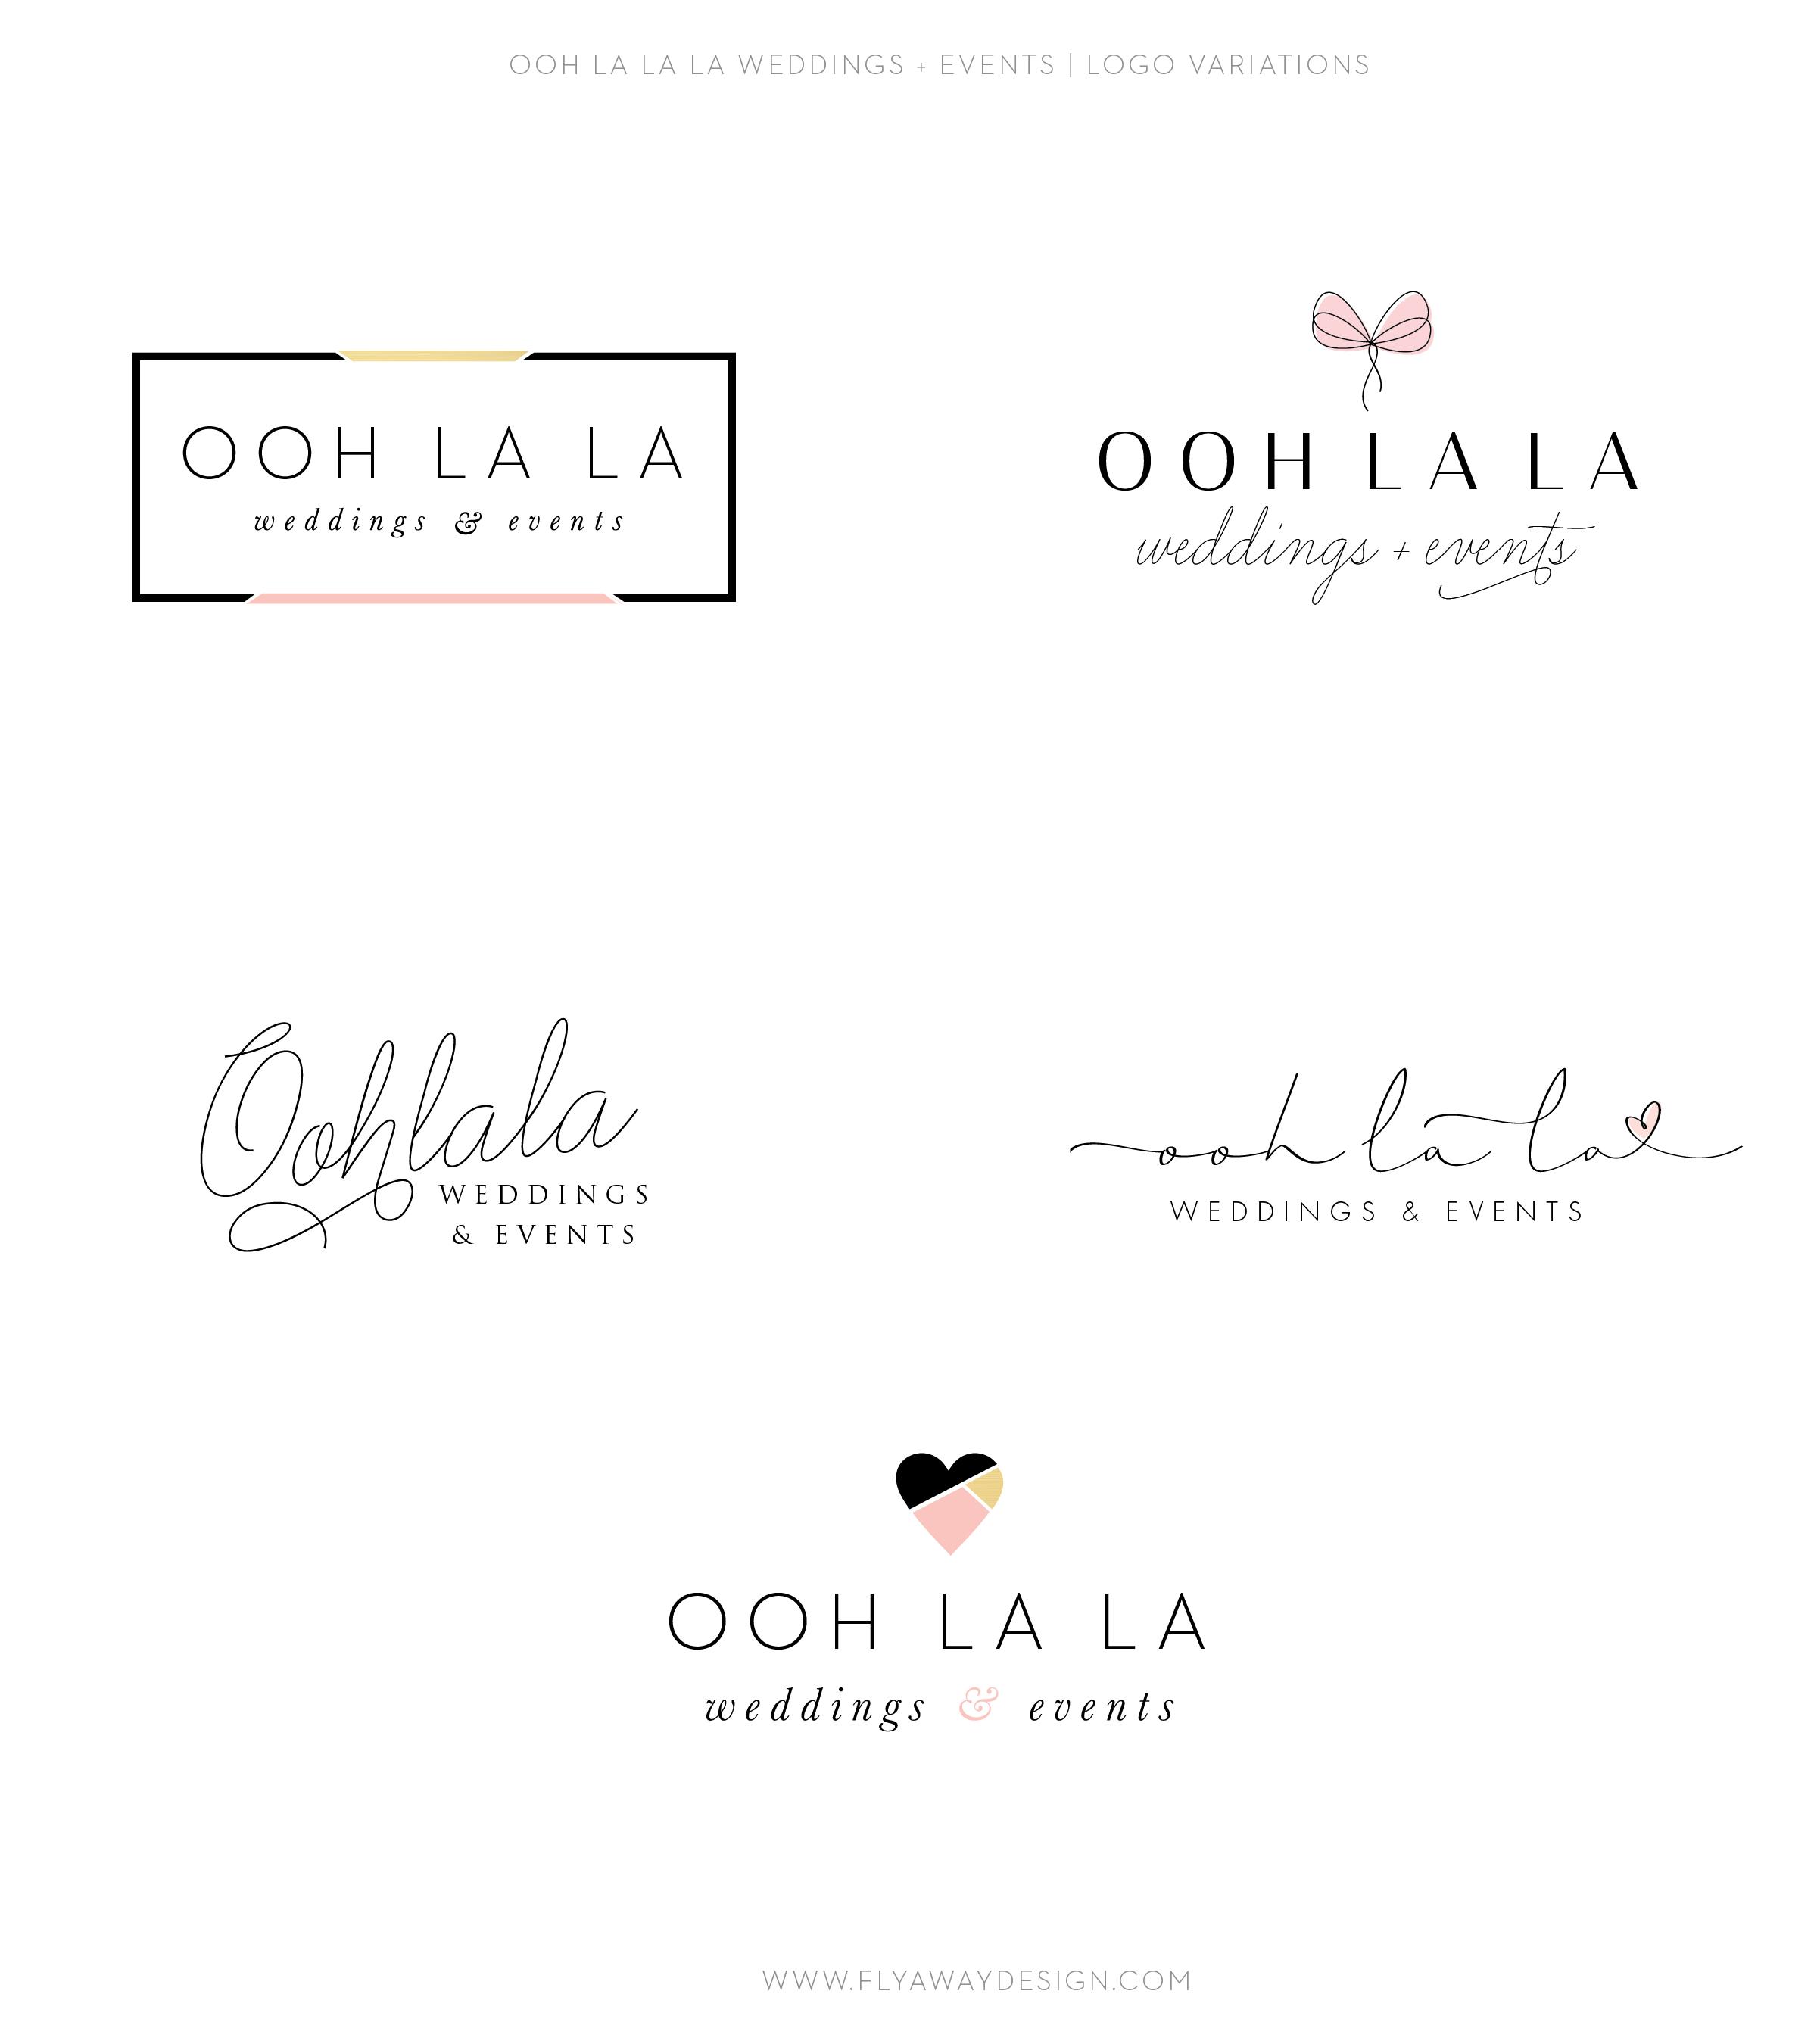 logo_branding_variations.jpg